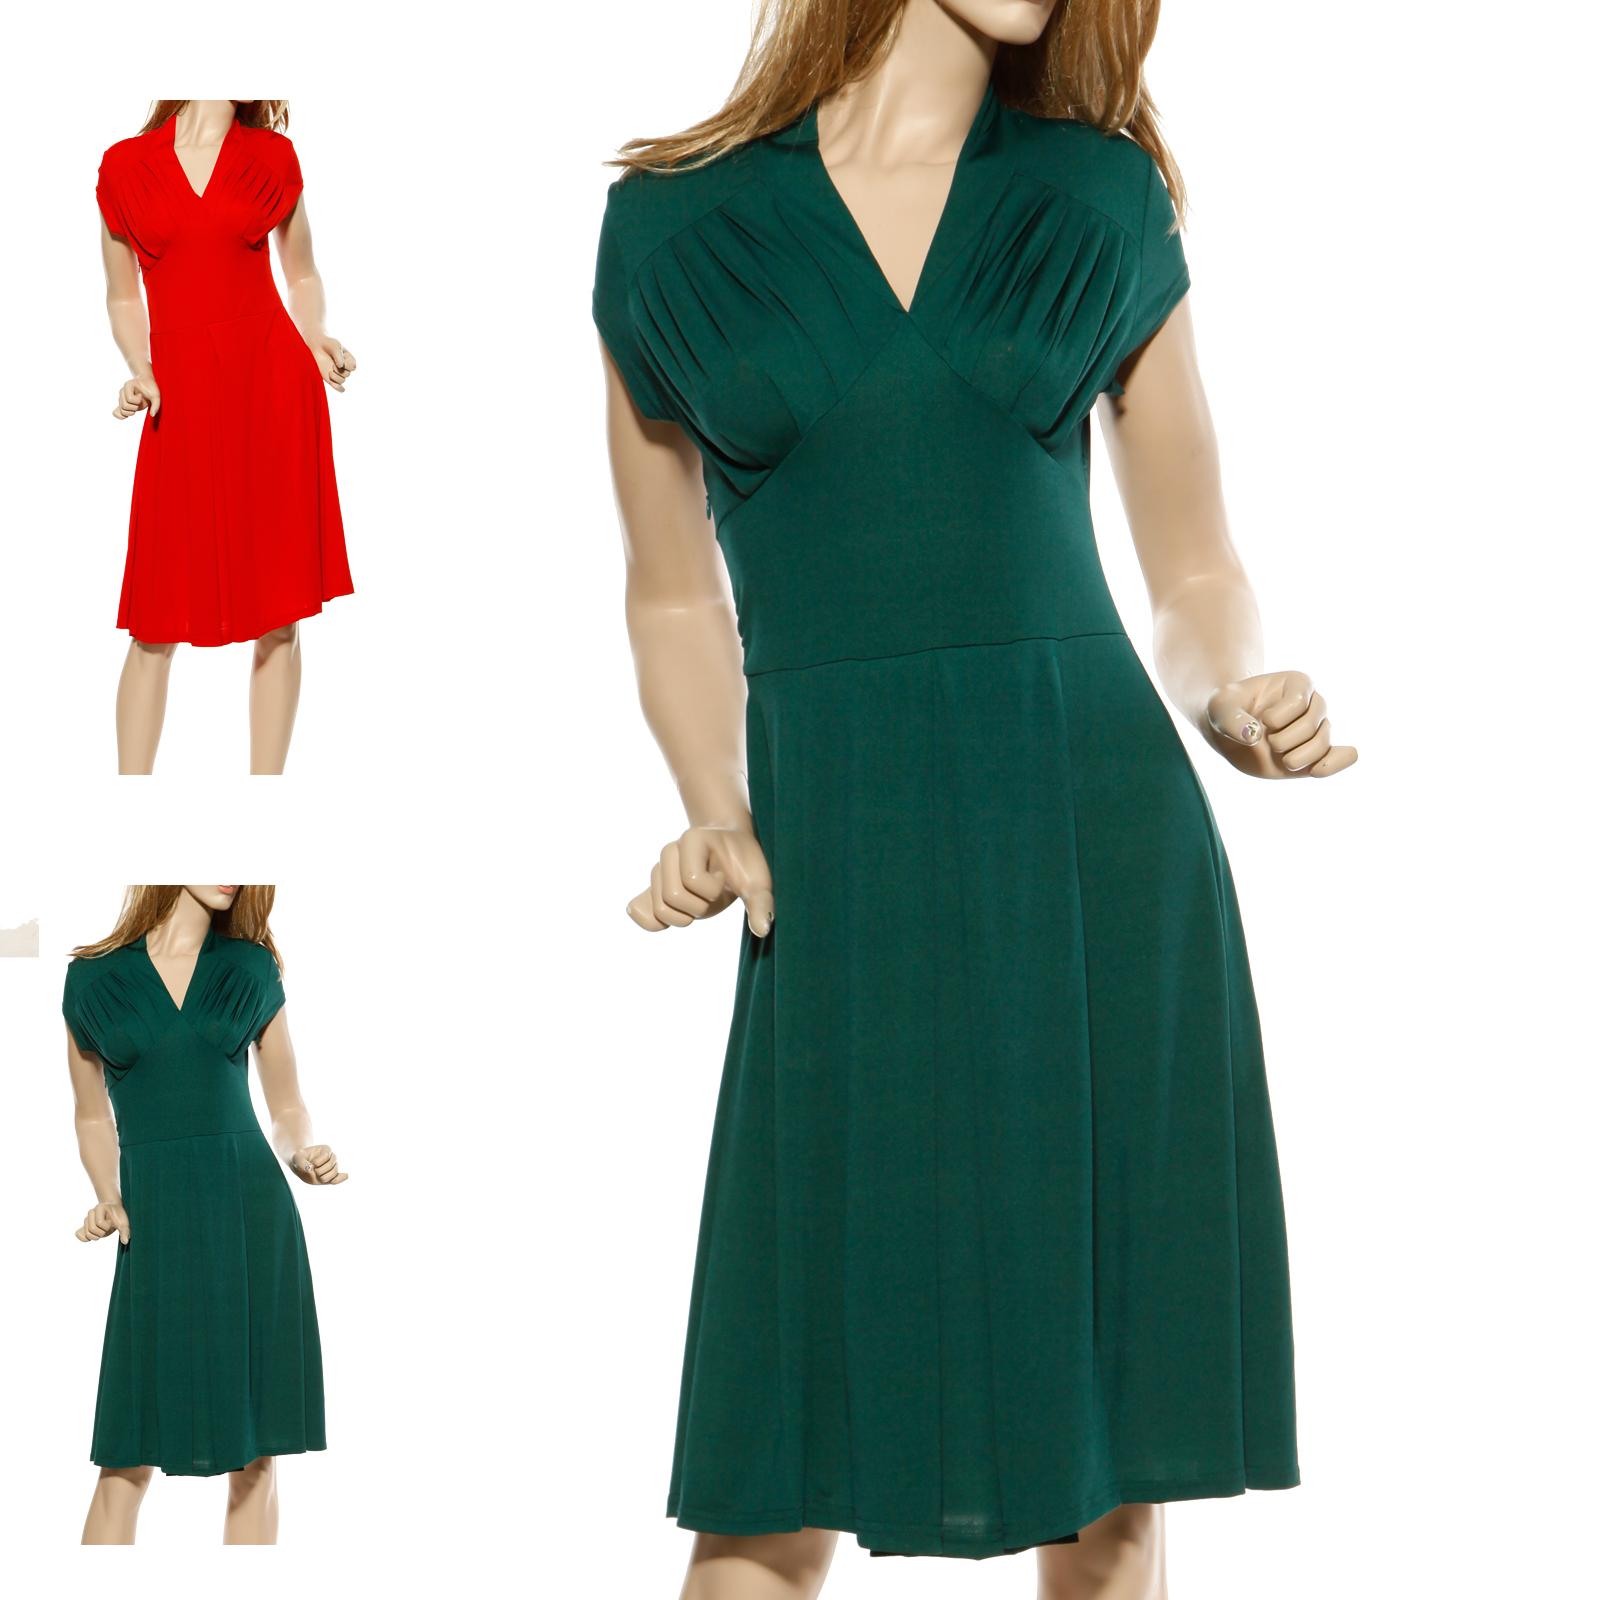 50er 60er damen business swing kleider petticoat partykleid ballkleid abendkleid ebay. Black Bedroom Furniture Sets. Home Design Ideas